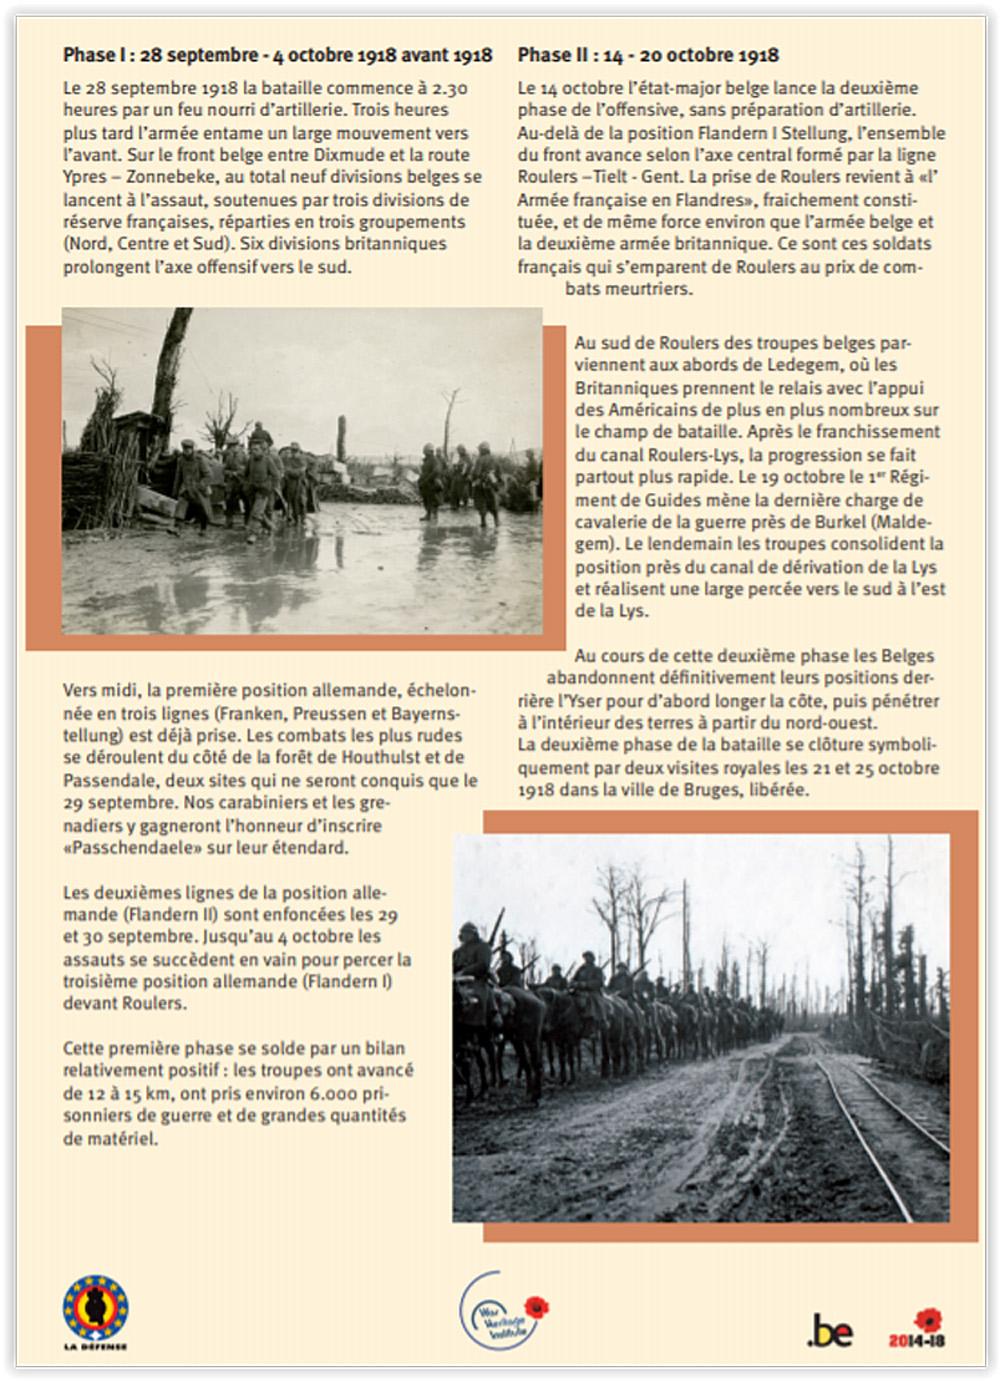 asu extrait bataille moorslede 4 Oct 1918